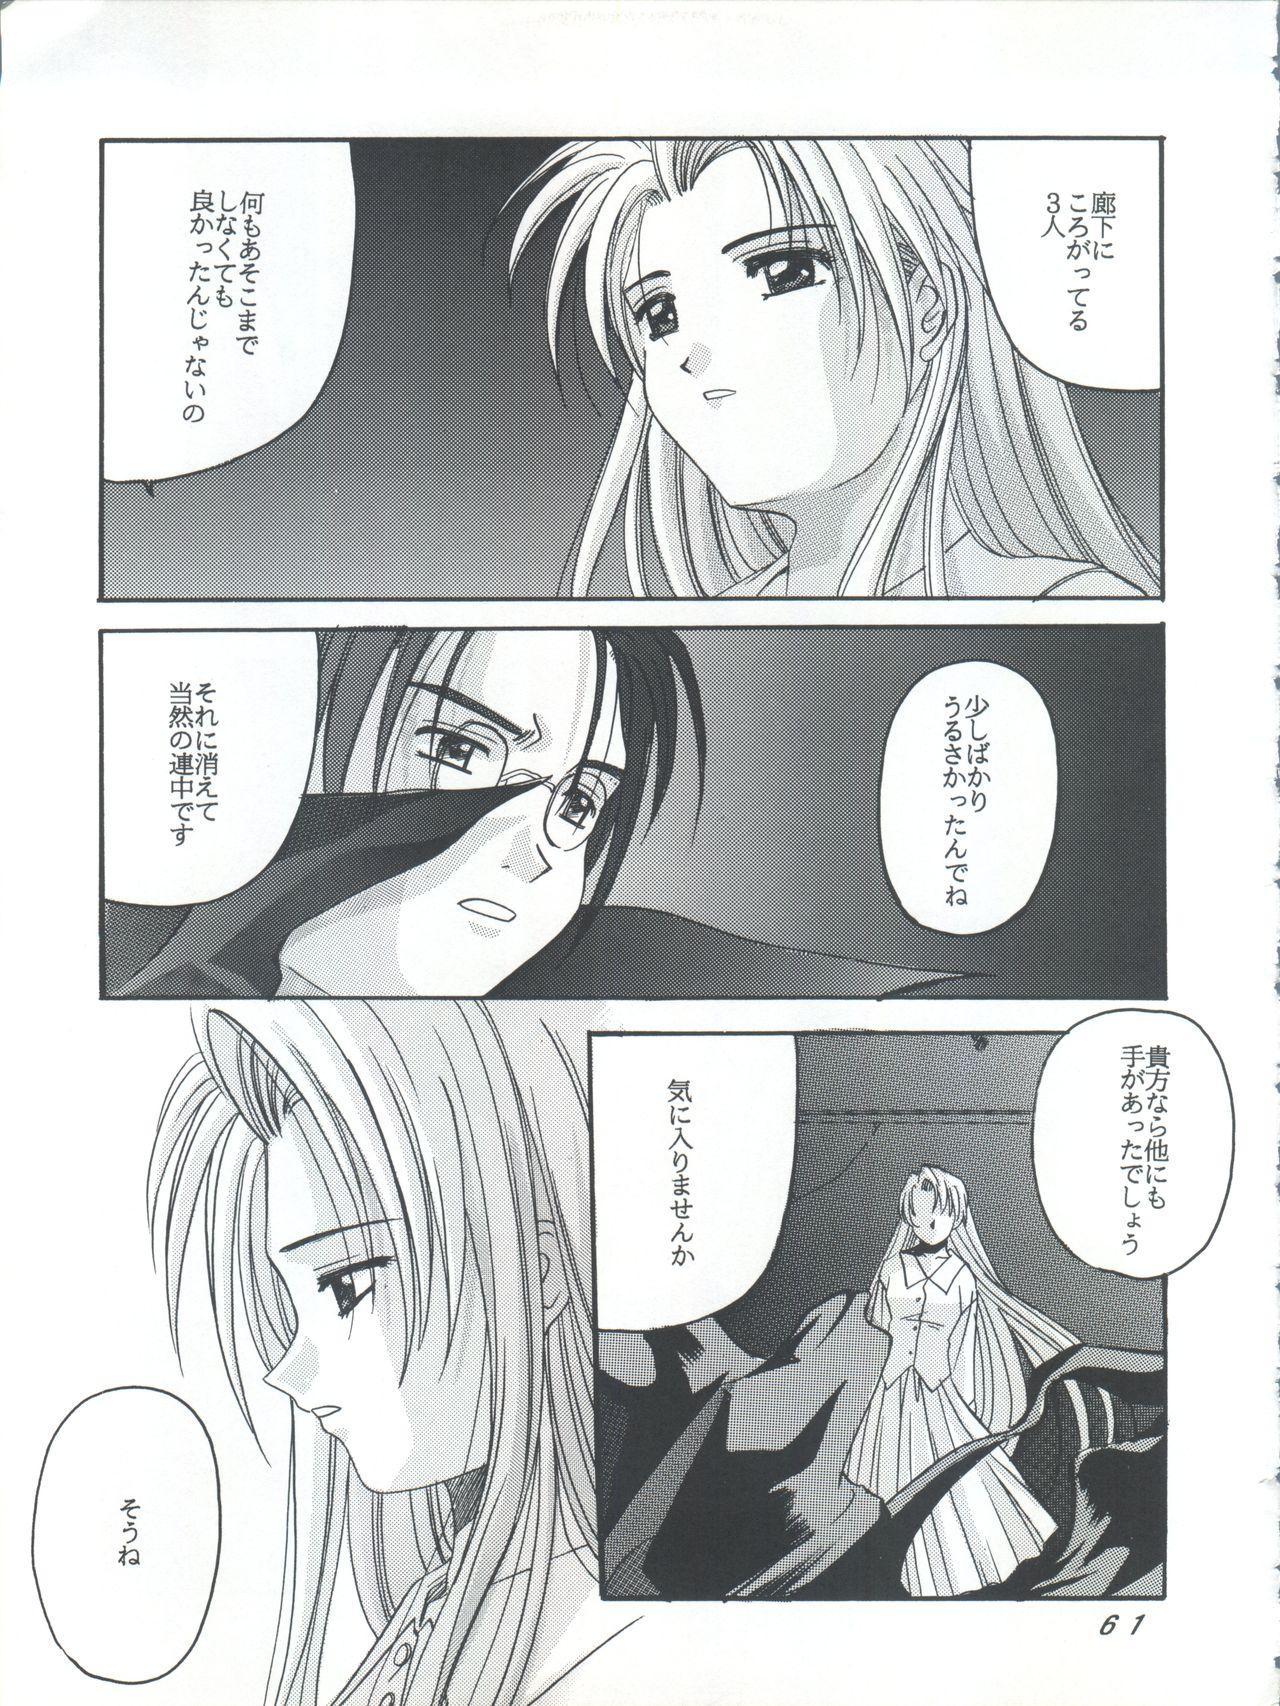 Card Captor Sakura Act 3 Green Version 59